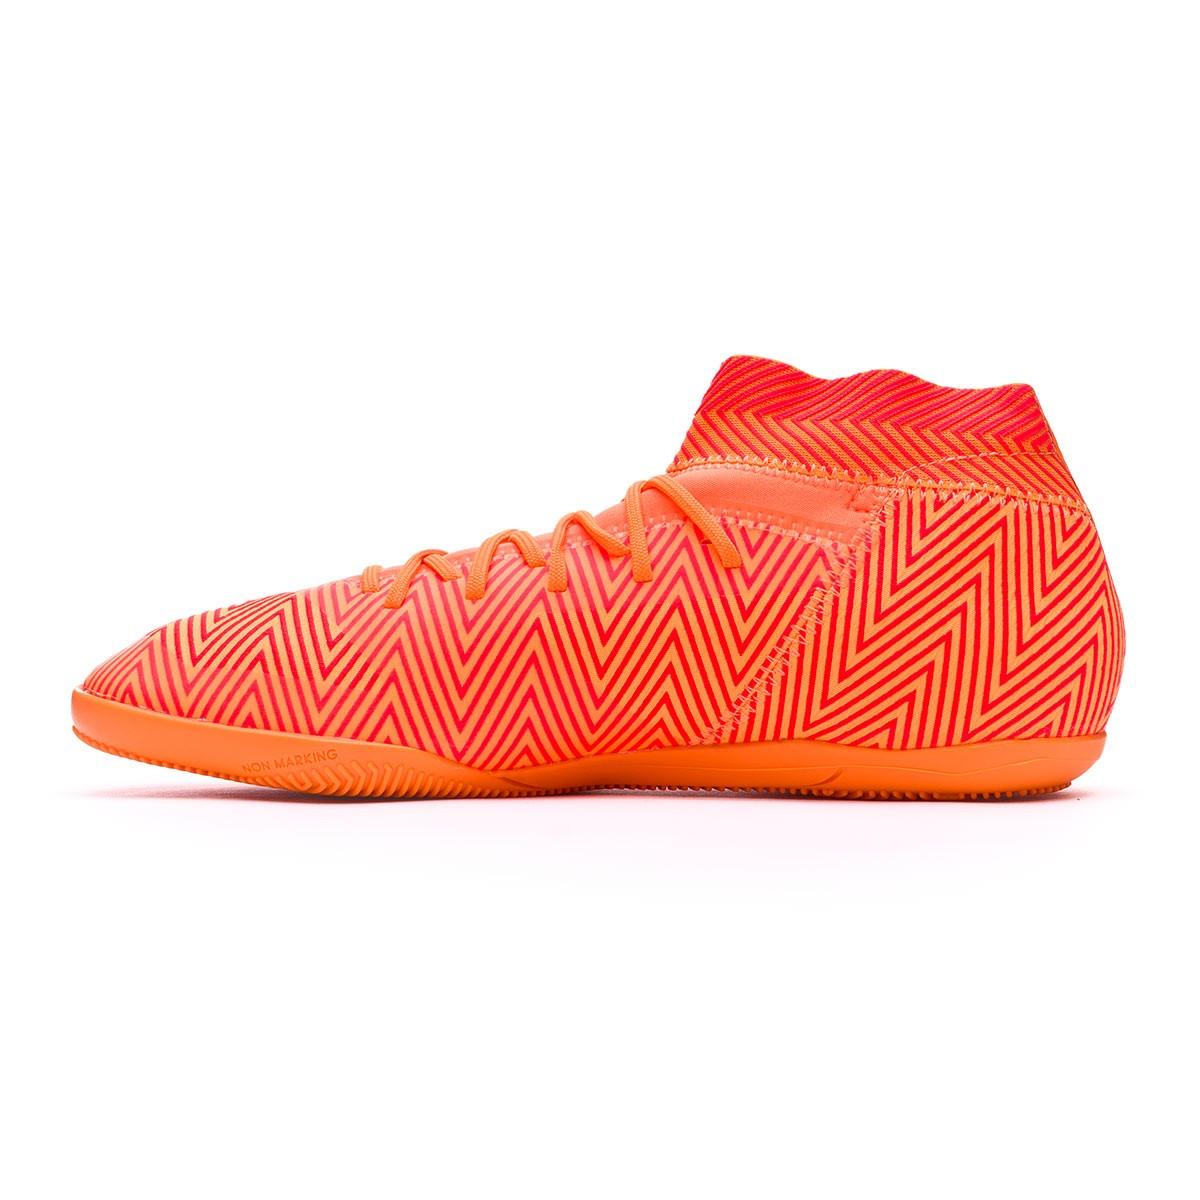 8e586732d Futsal Boot adidas Nemeziz Tango 18.3 IN Zest-Black-Solar red - Tienda de  fútbol Fútbol Emotion